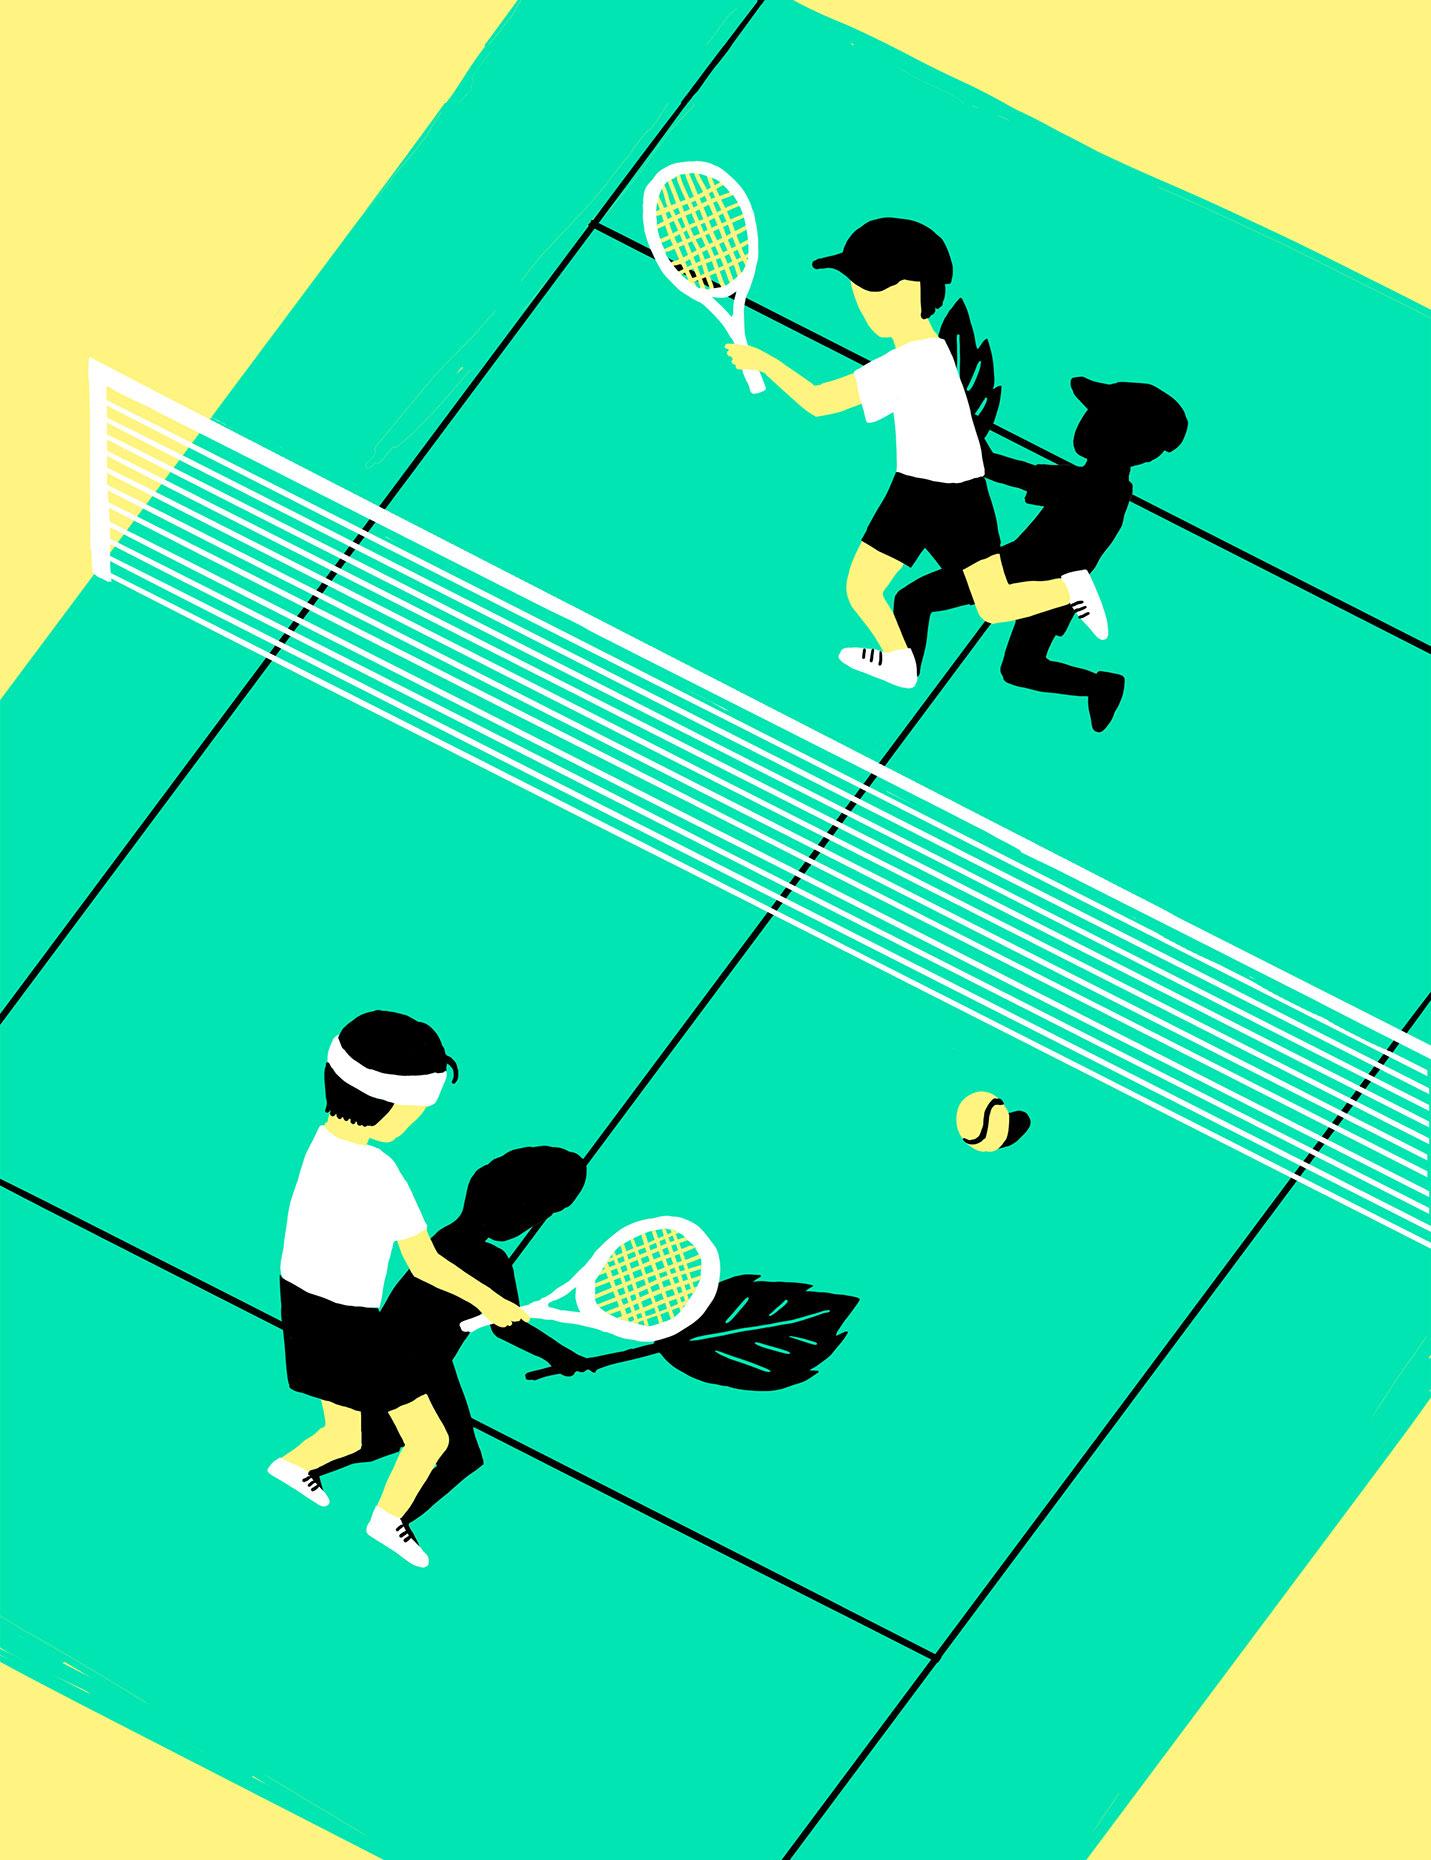 Zut_Tennis.jpg